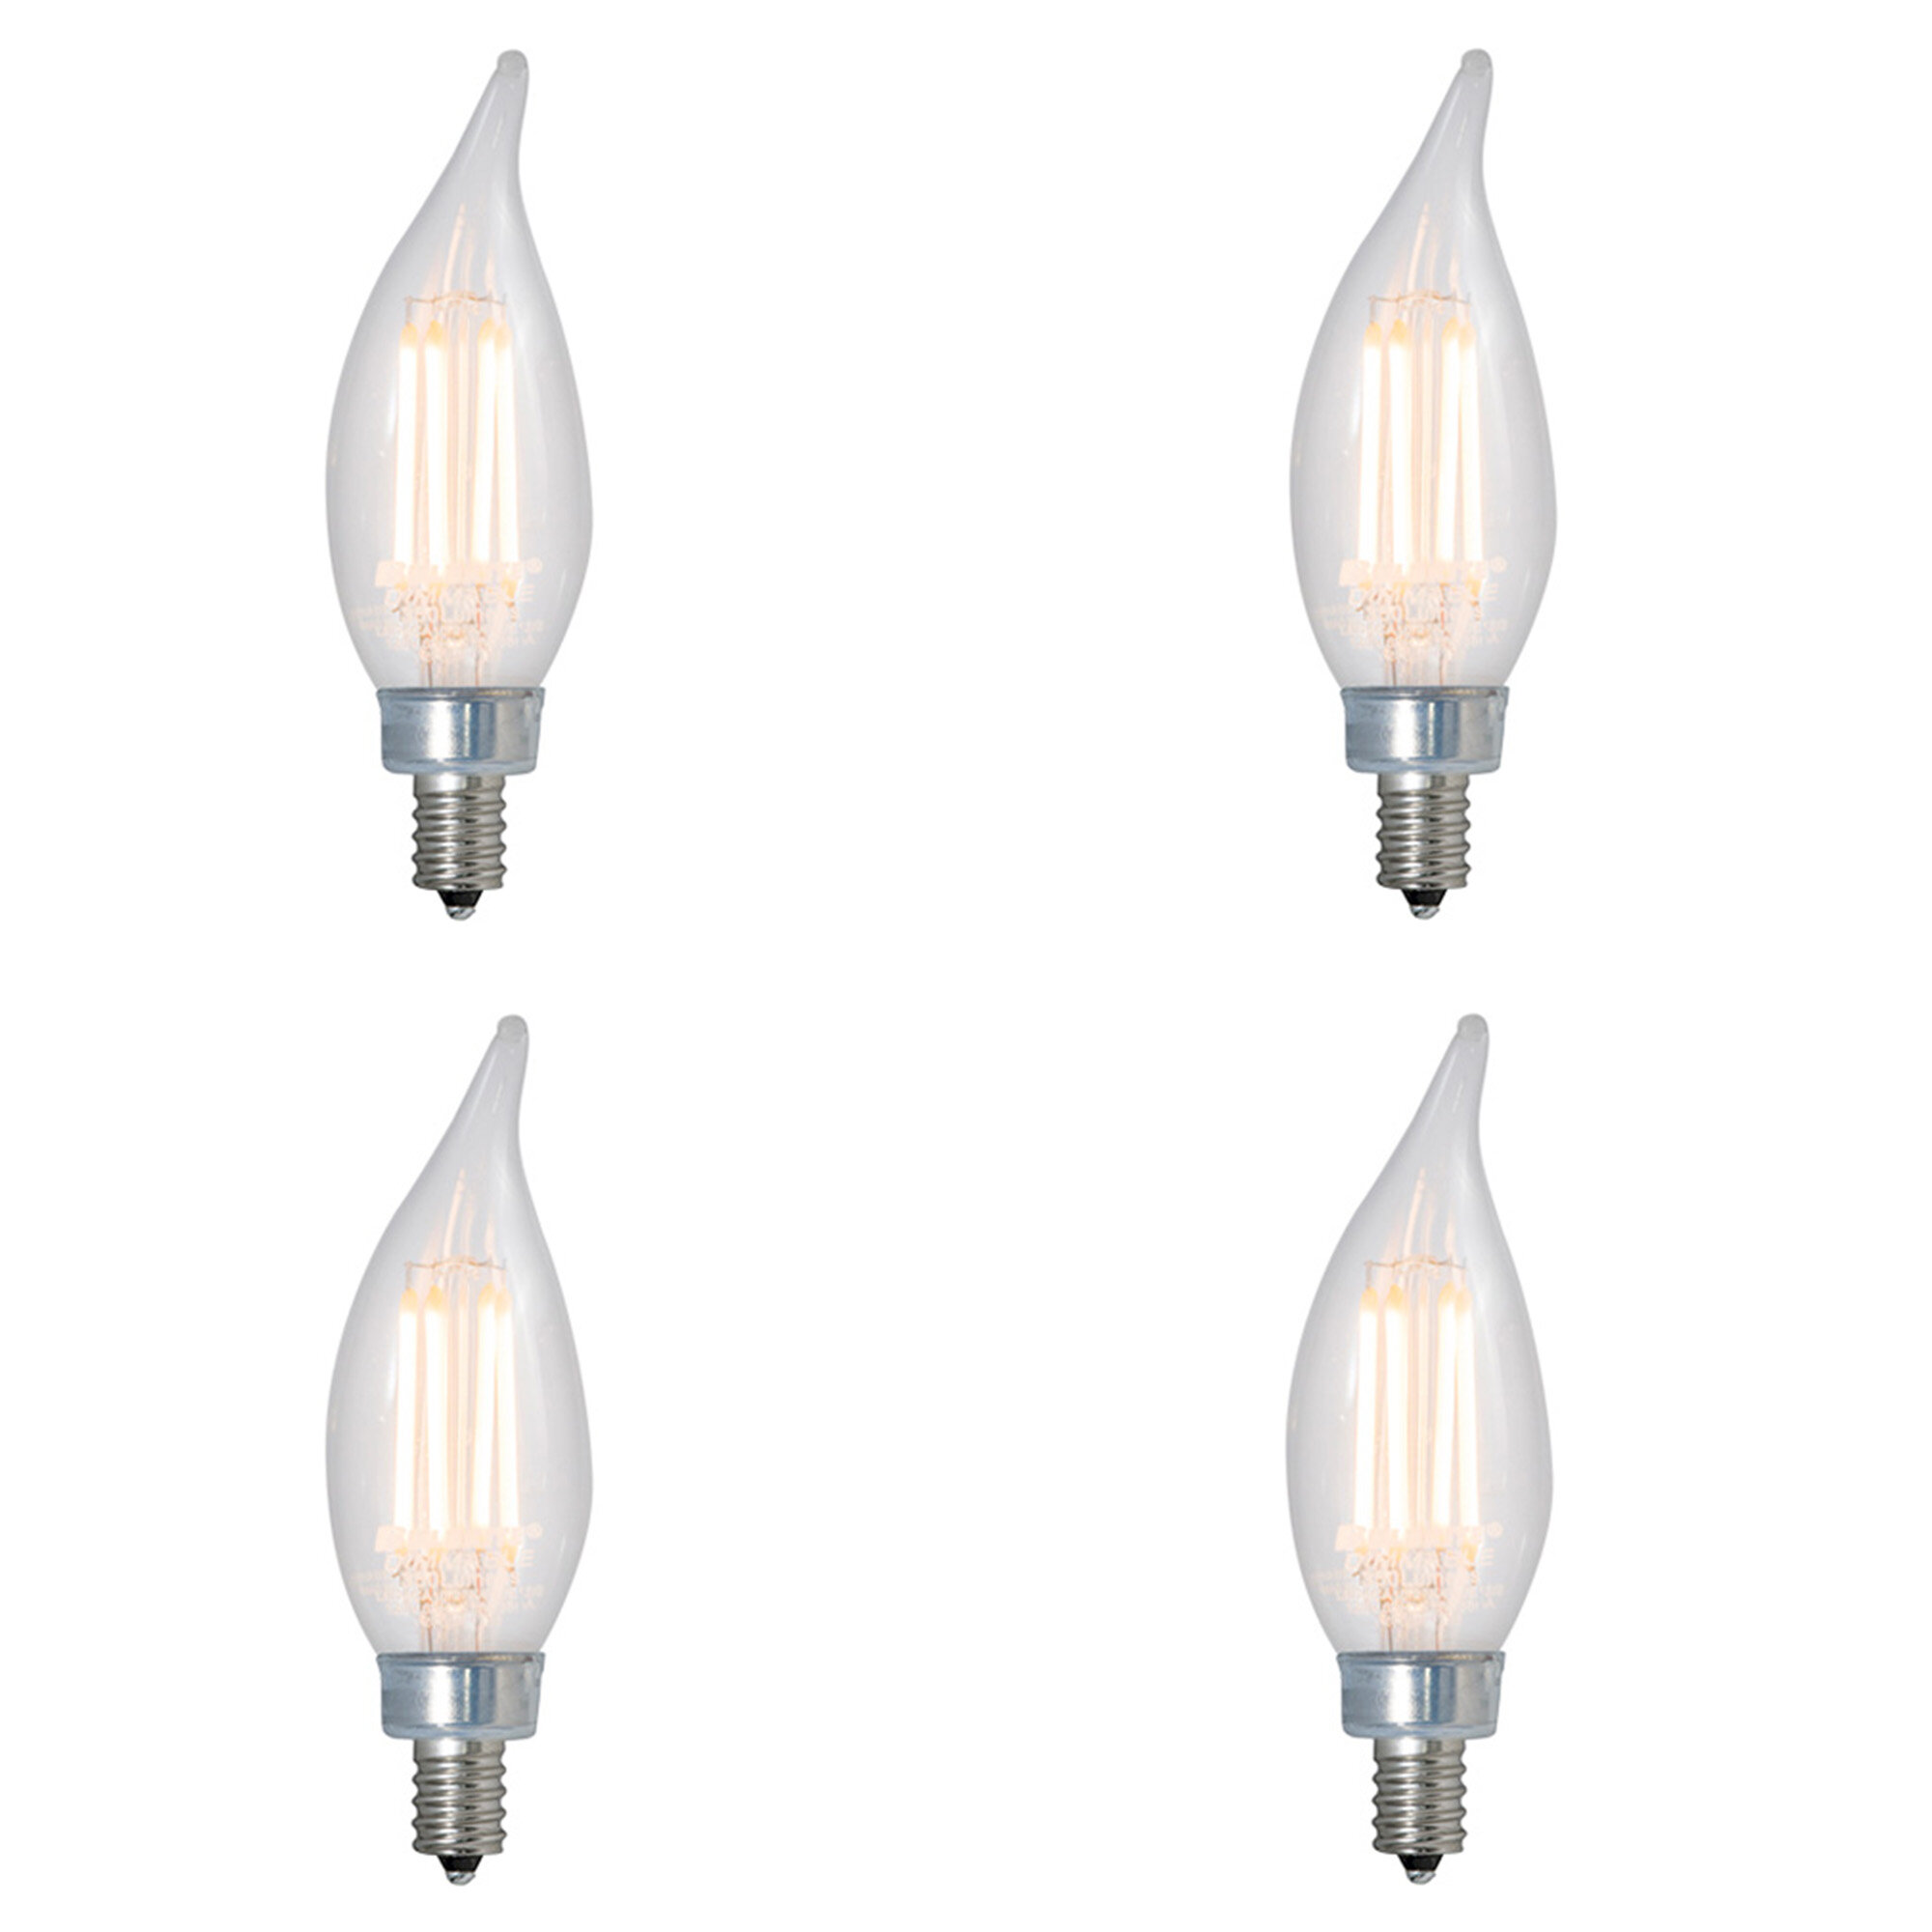 Bulbrite Industries 40 Watt Equivalent Ca10 Led Dimmable Light Bulb 2700k E12 Candelabra Base Reviews Wayfair